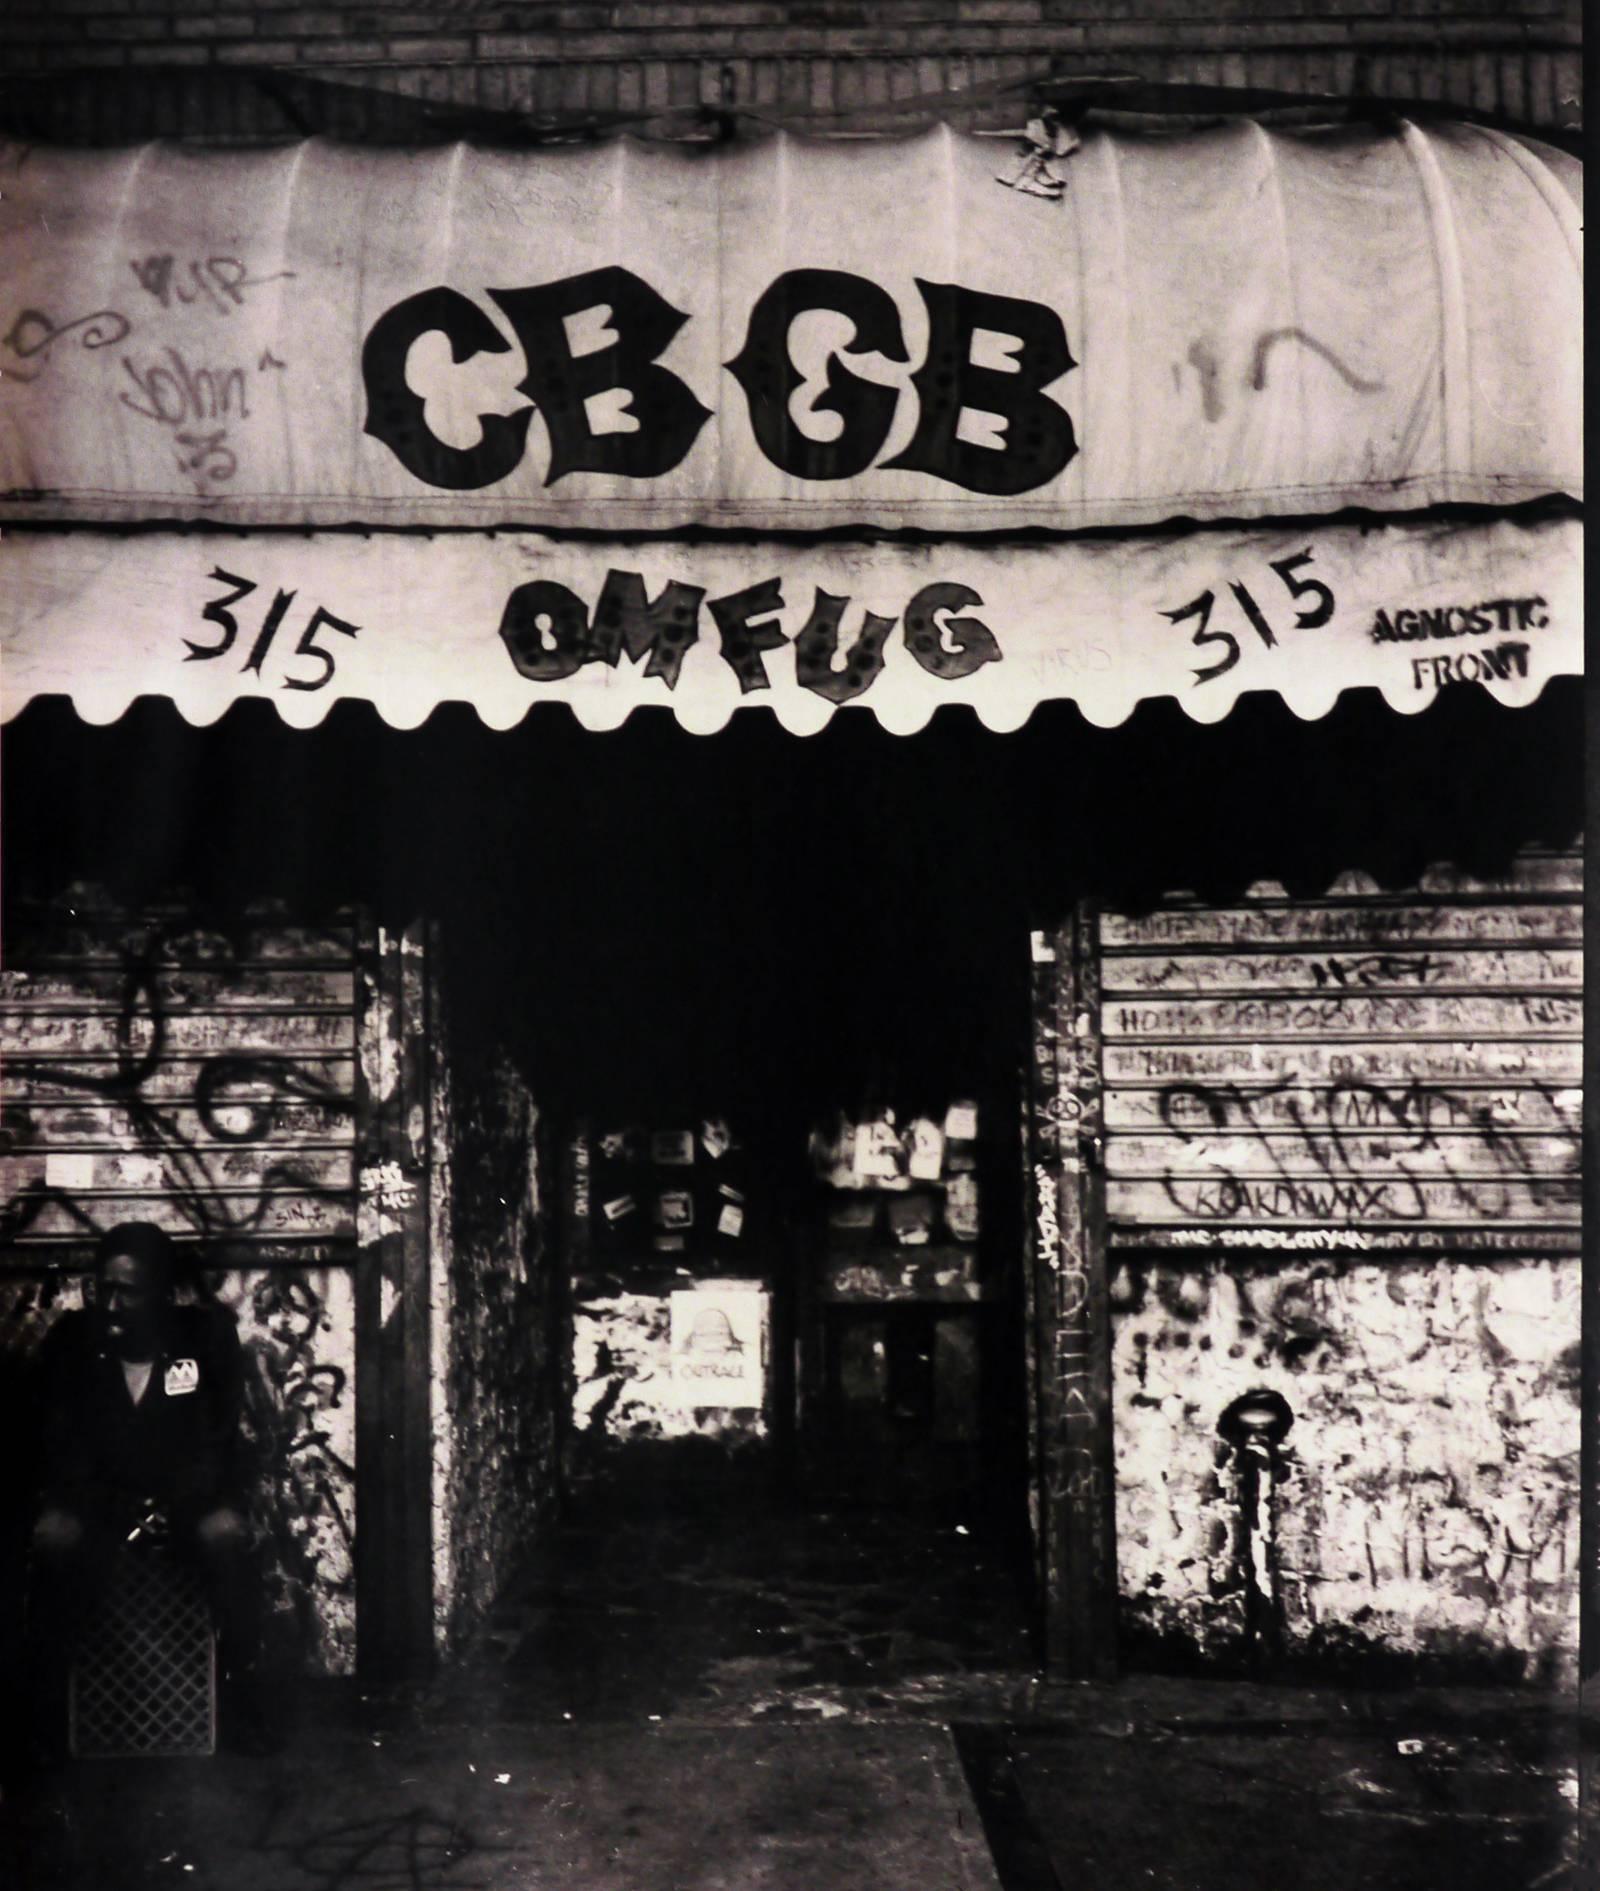 CBGB photograph East Village (CBGB Bowery NYC)